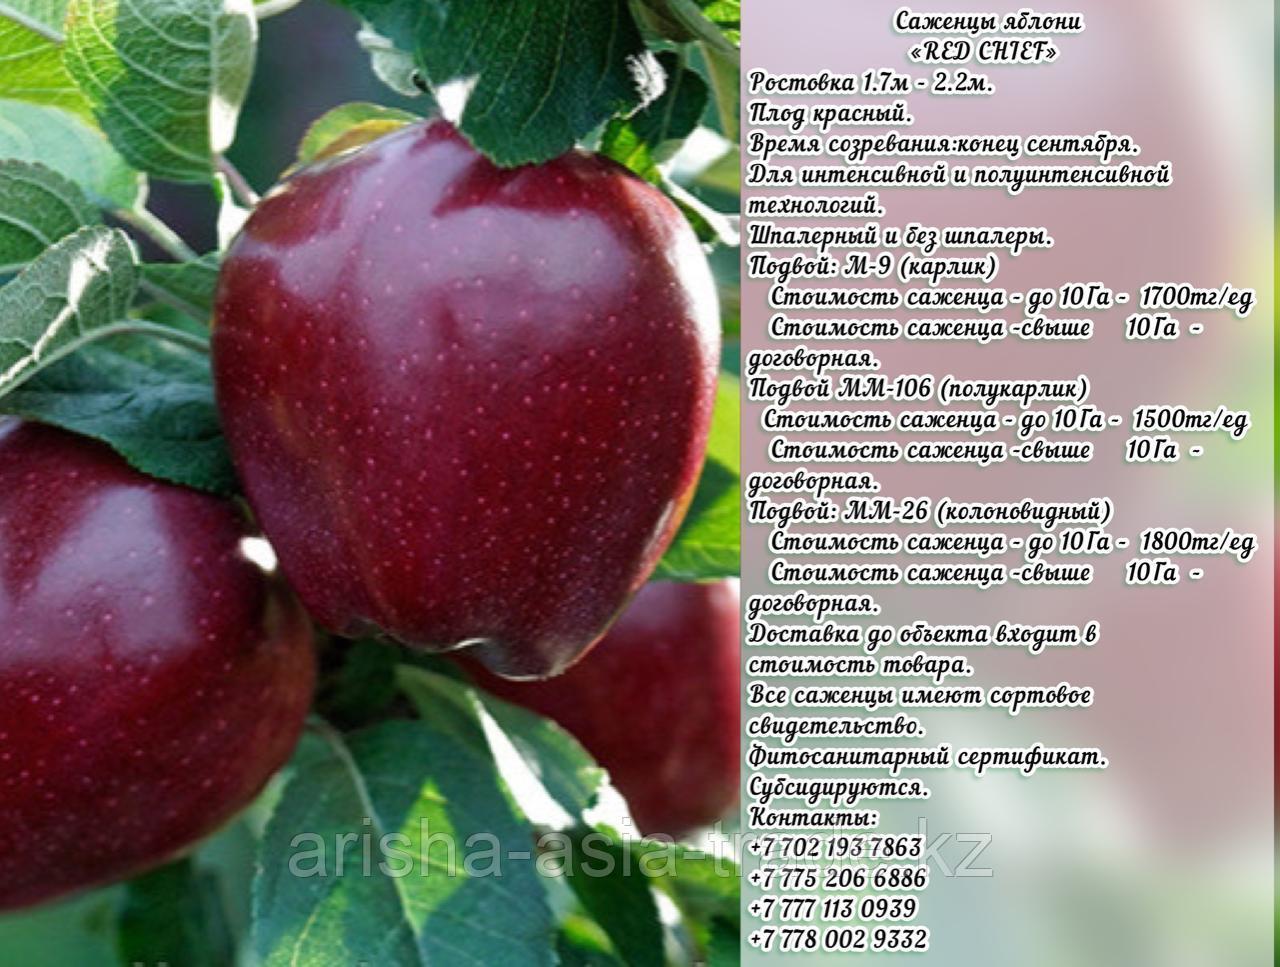 "Саженцы яблони ""Red Chief"" (Ред Чиф) подвой мм 26 Сербия"